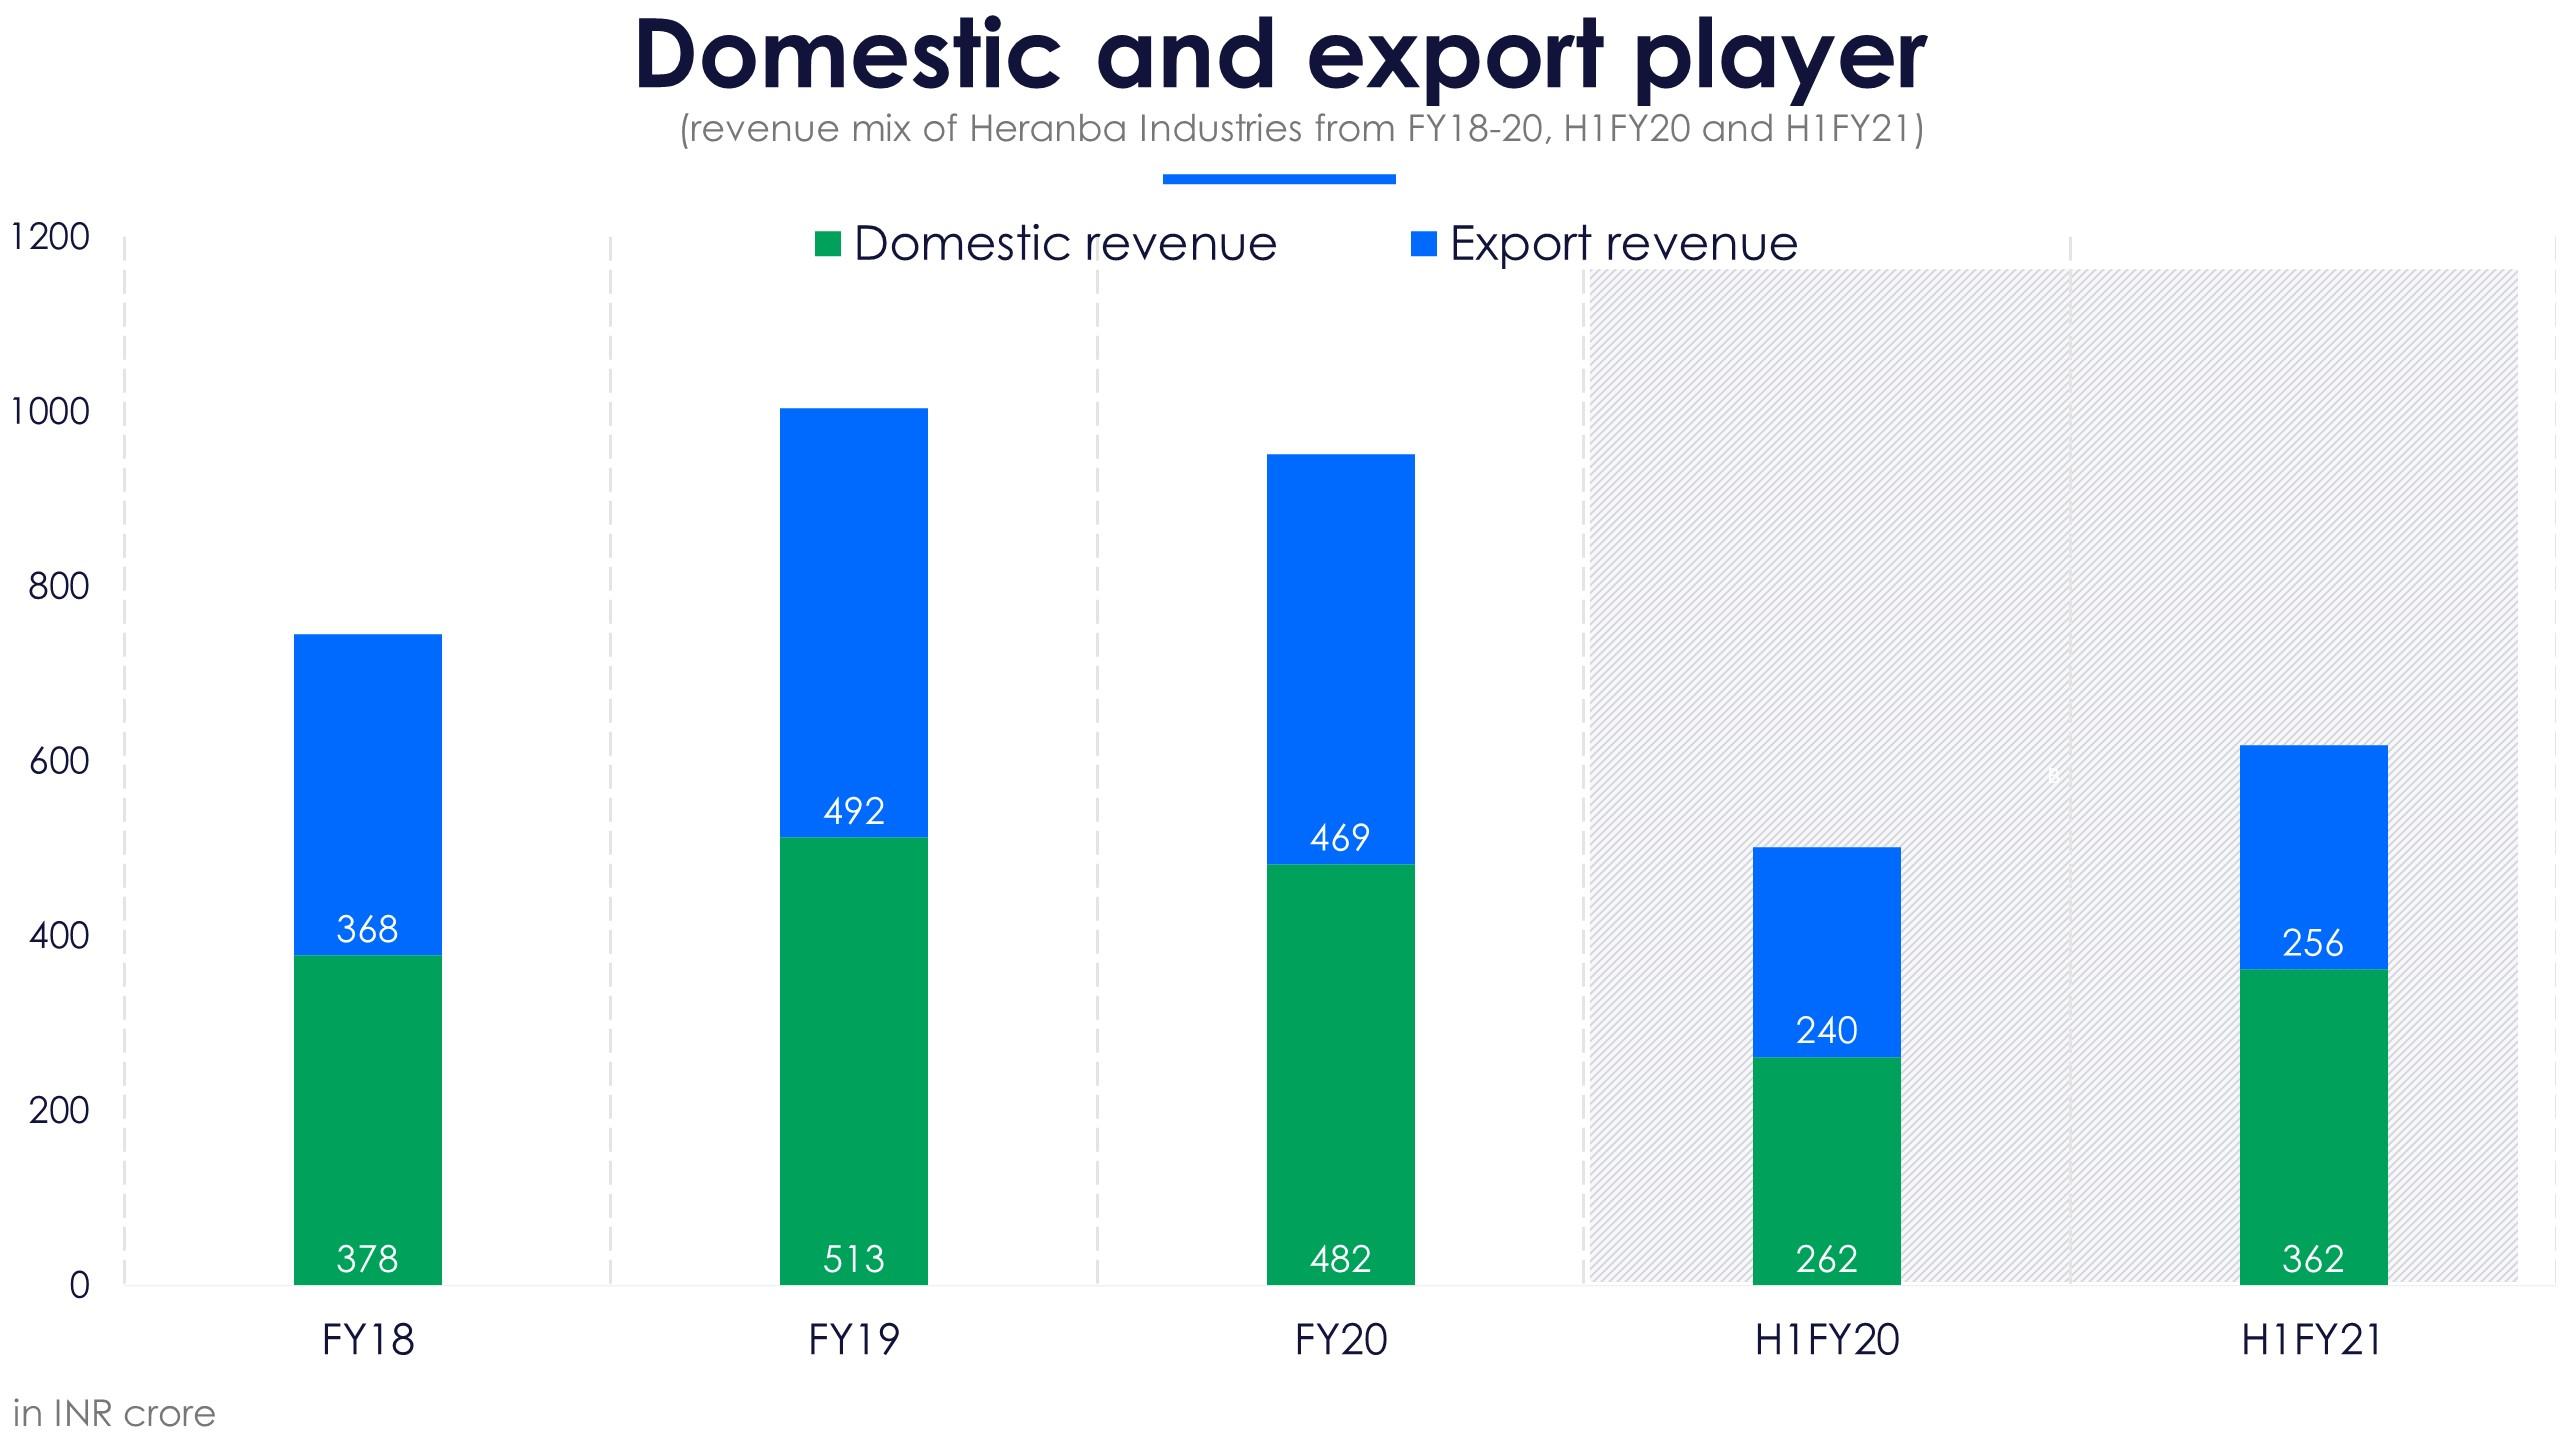 Heranba Domestic and Export Revenue